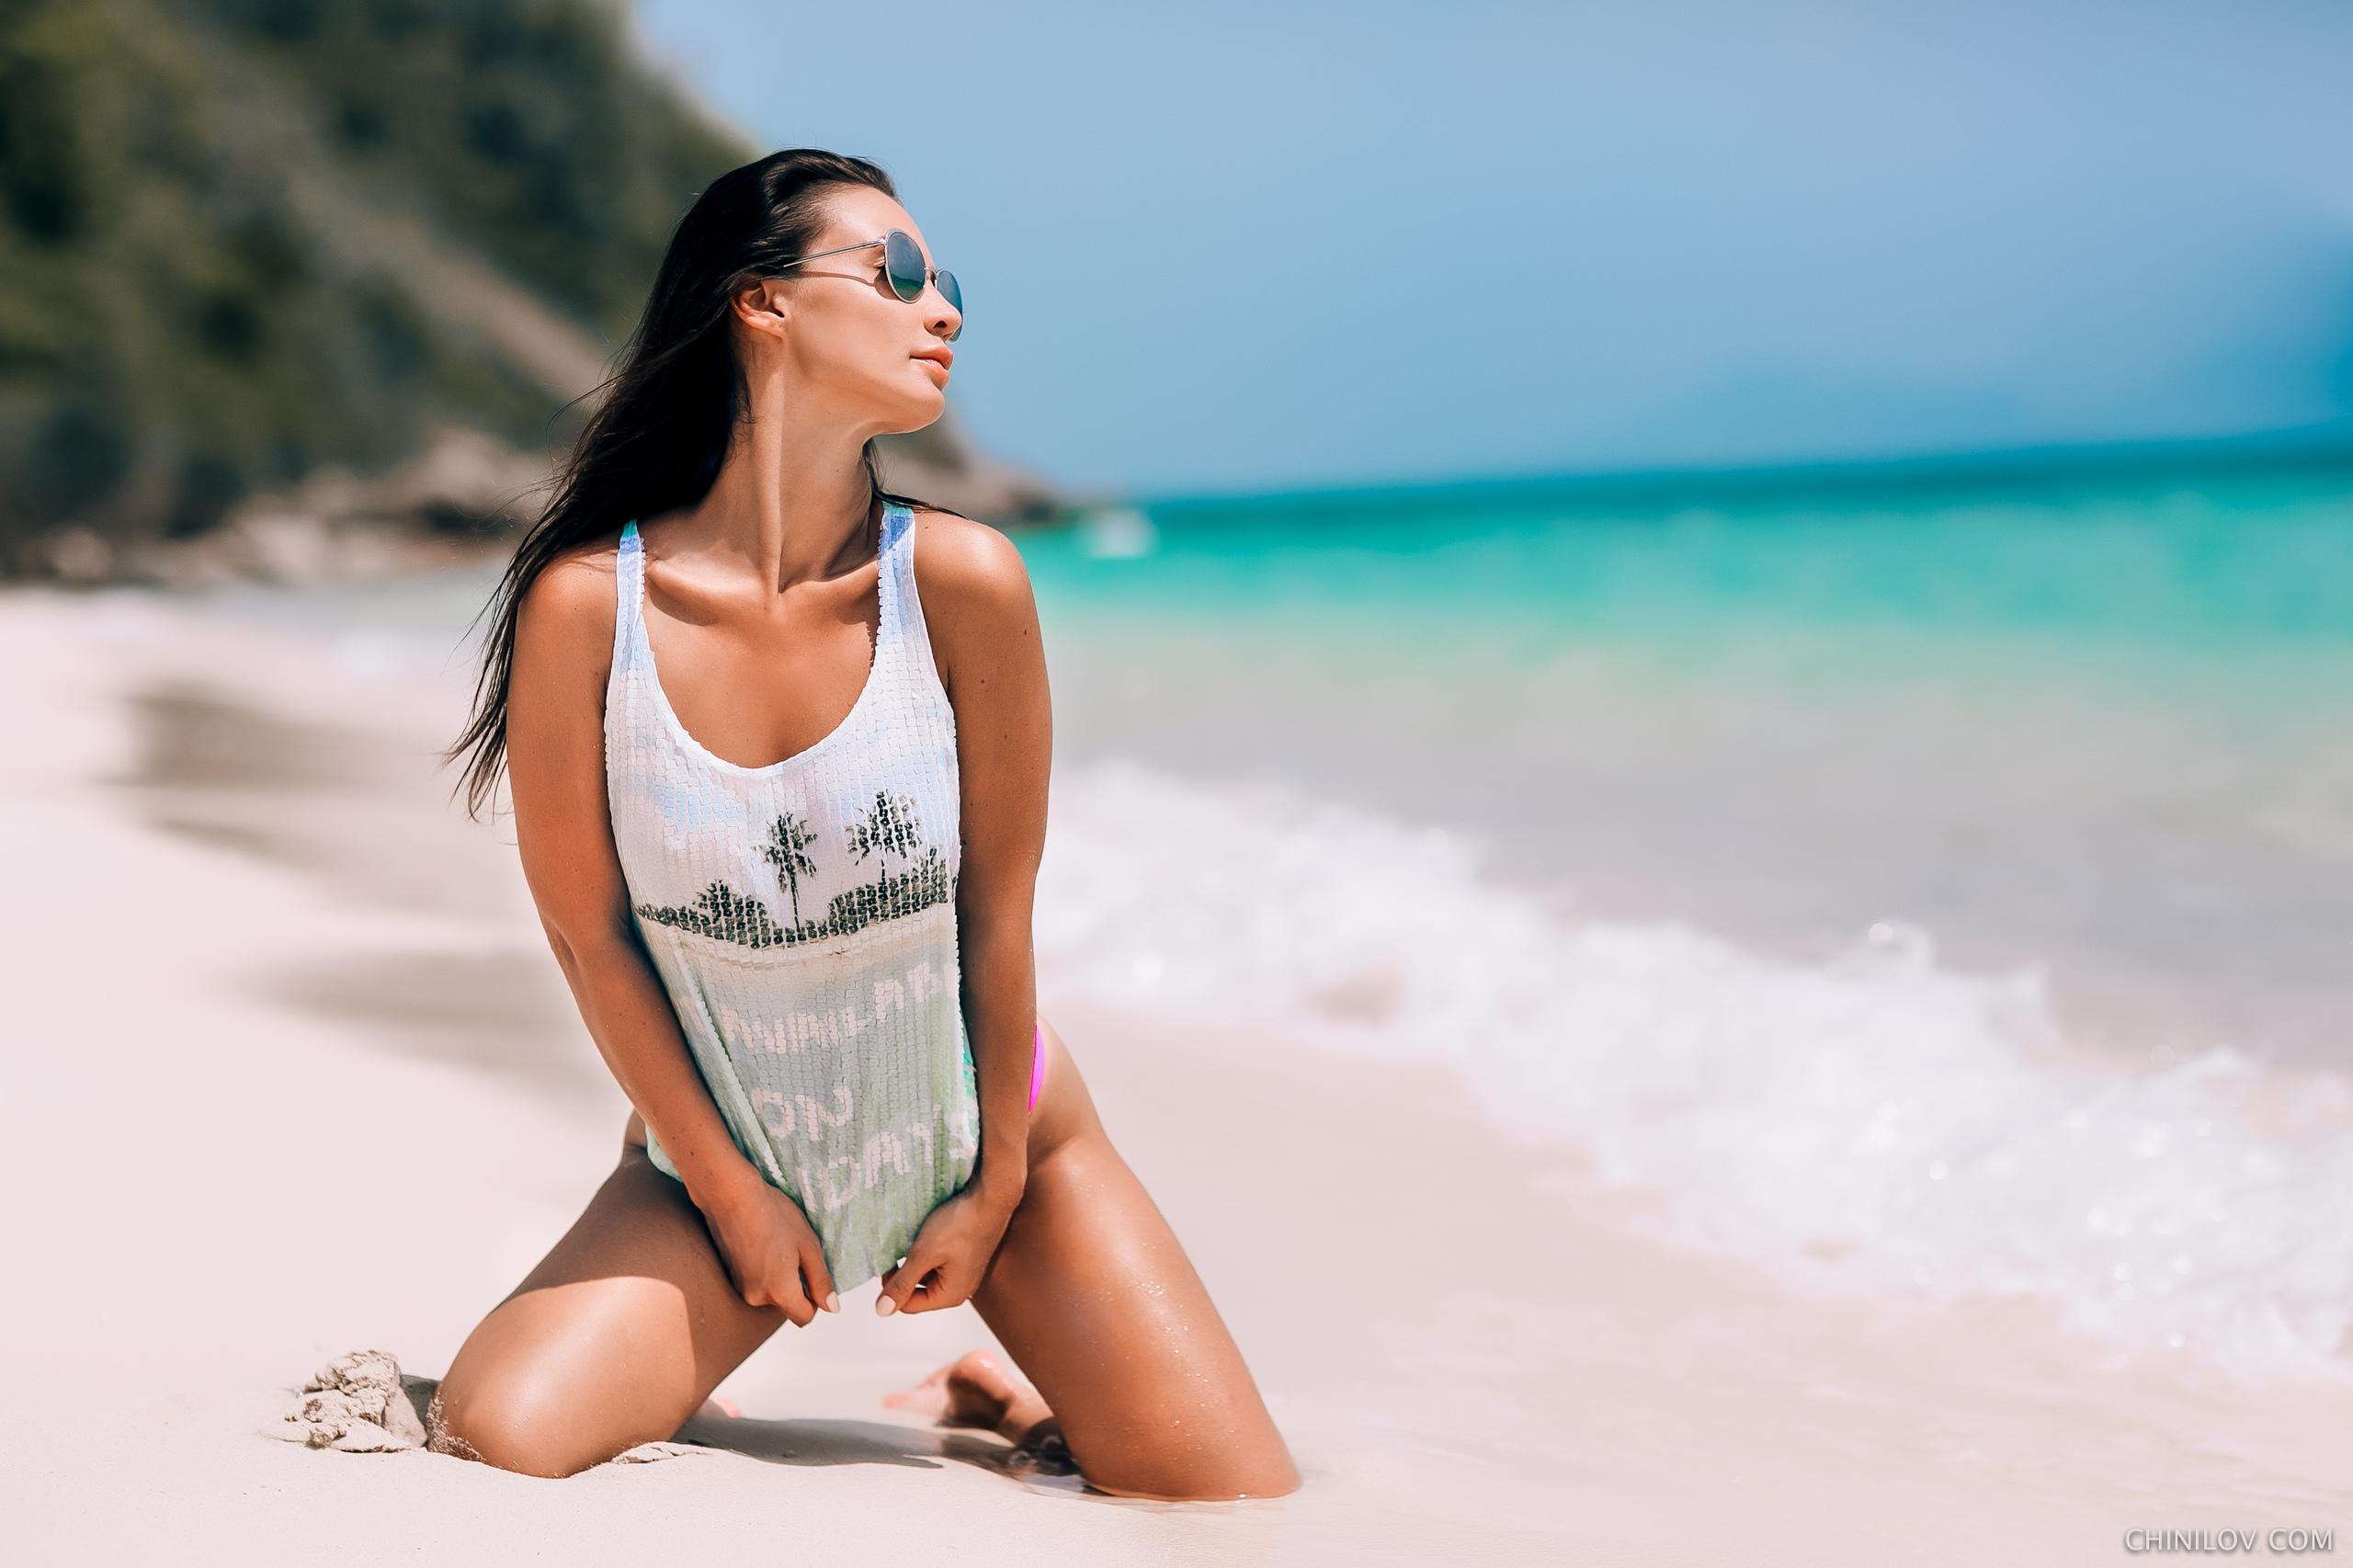 утренний ветерок брюнетка в очках и на пляже матрона хозяйка